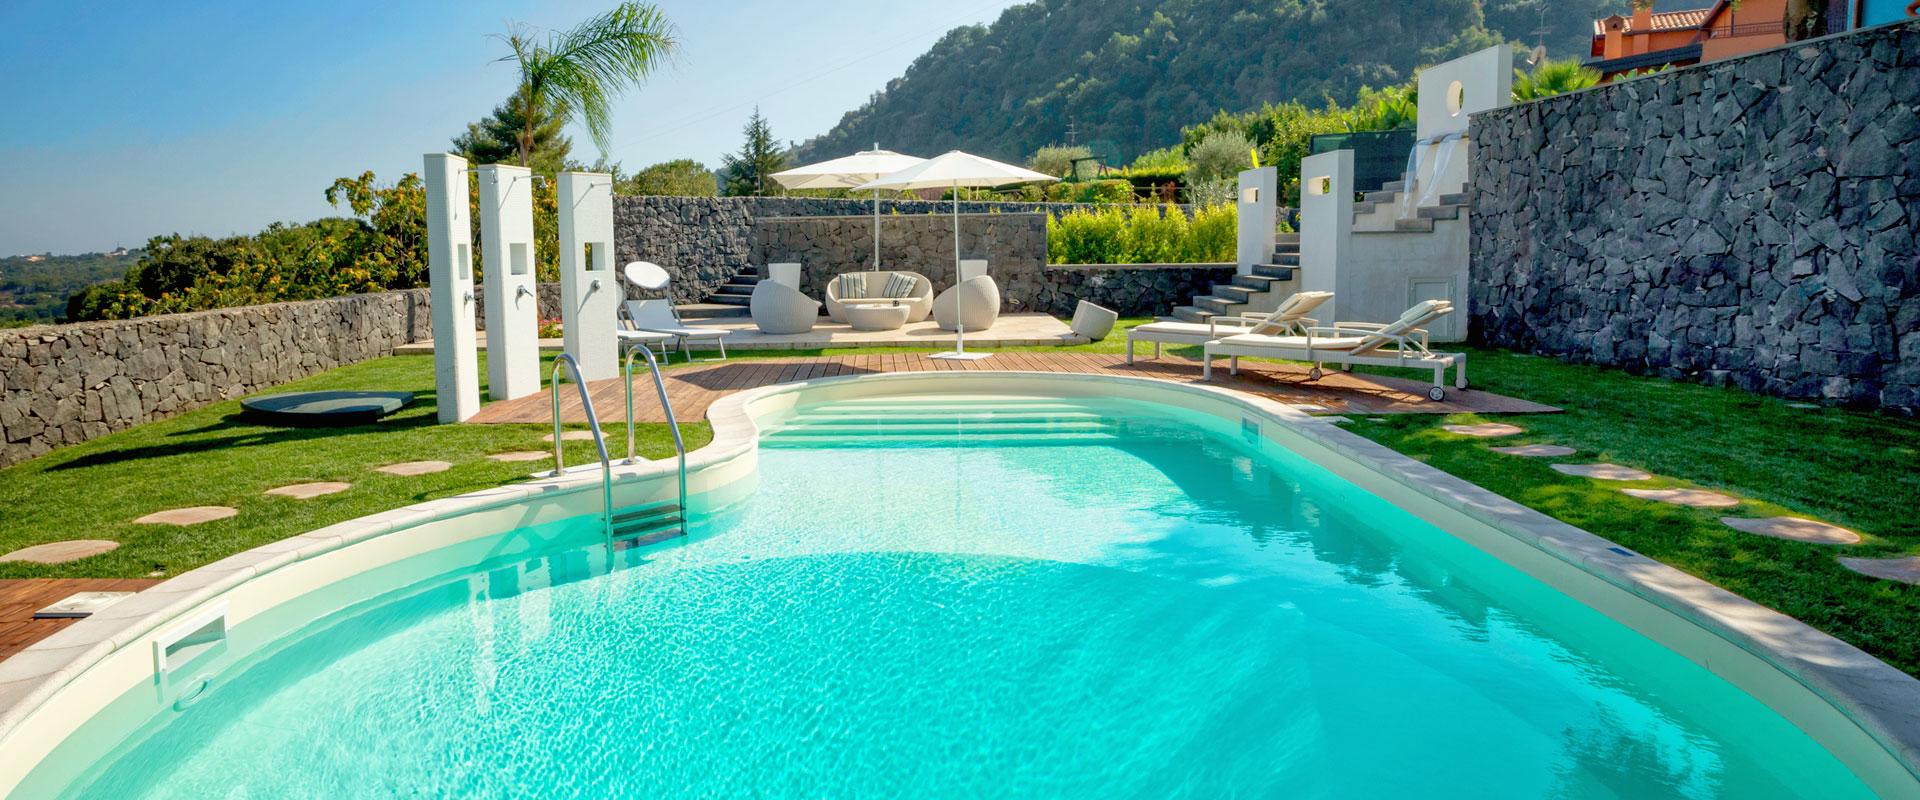 Terme aqvam for Abano terme piscine termali aperte al pubblico